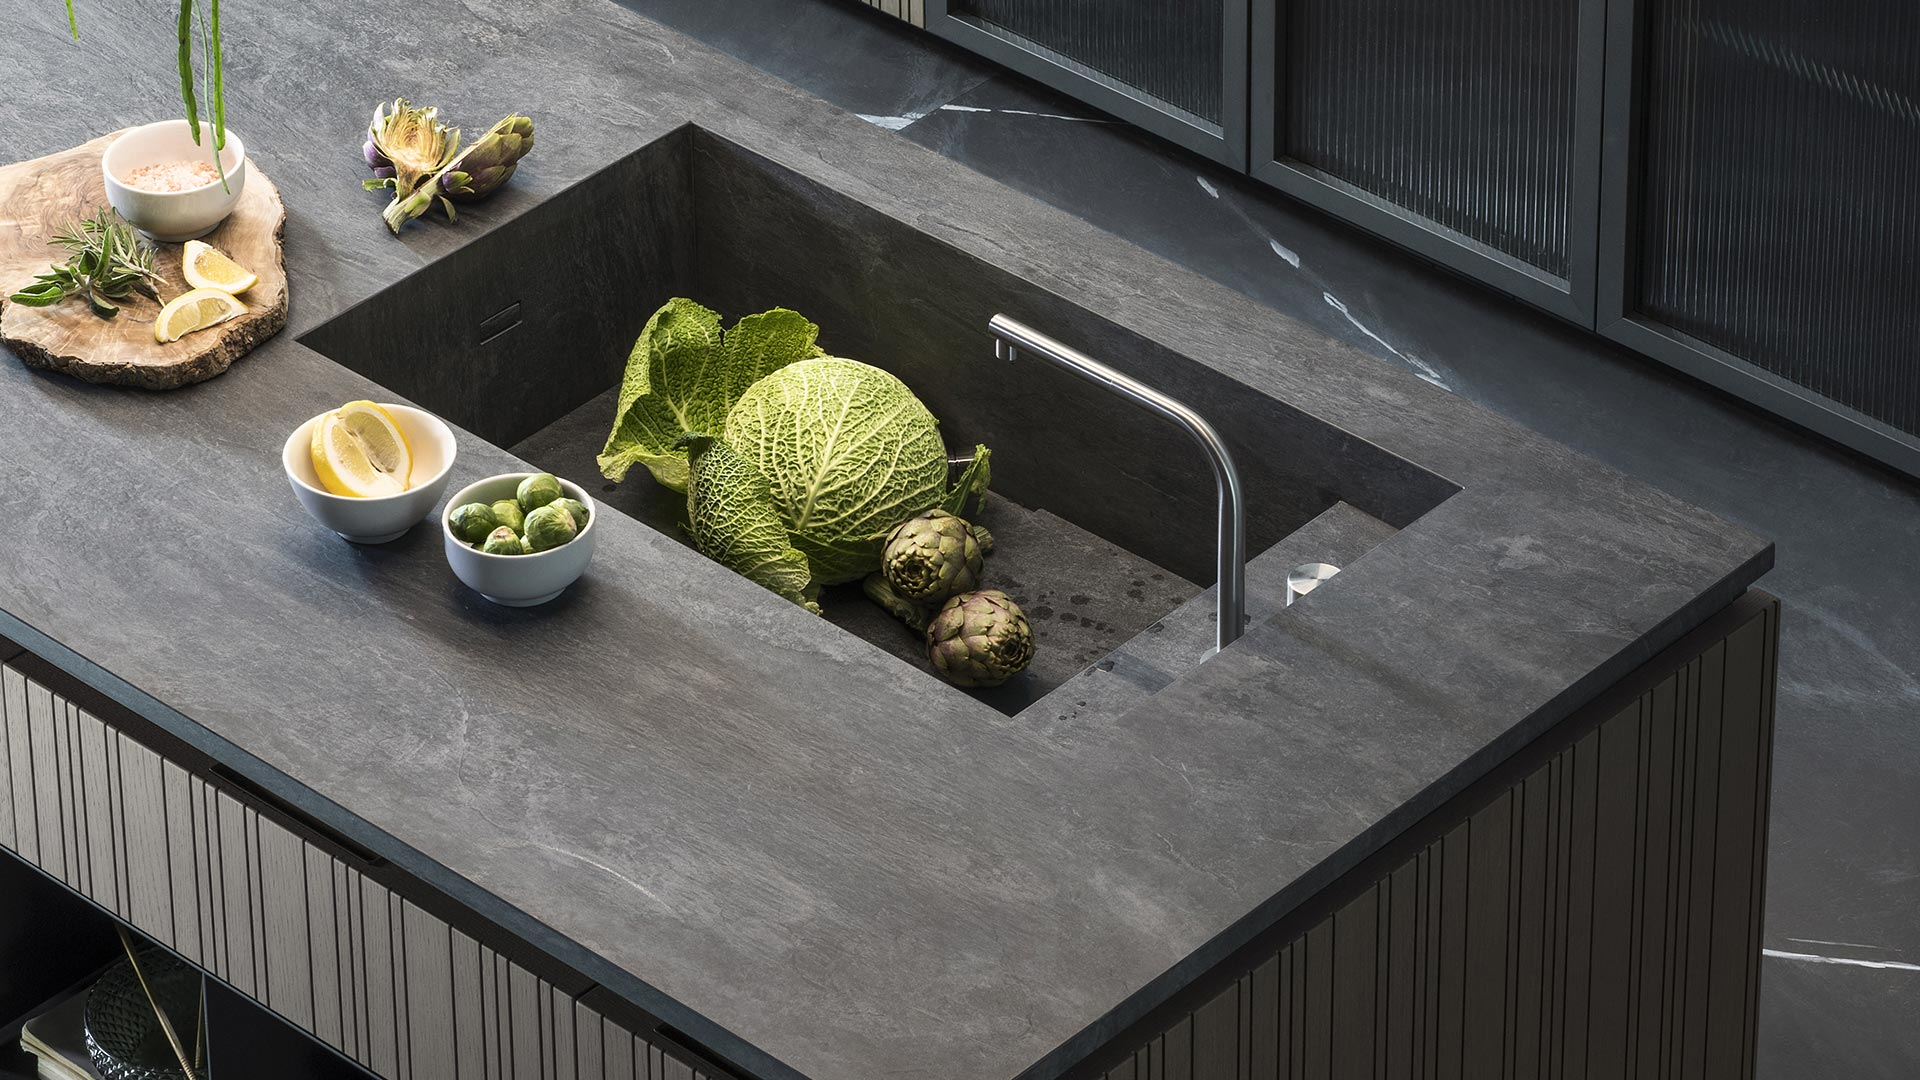 Design kitchen, wood kitchen - Collection RUA - TM_MI2018_Rua_005